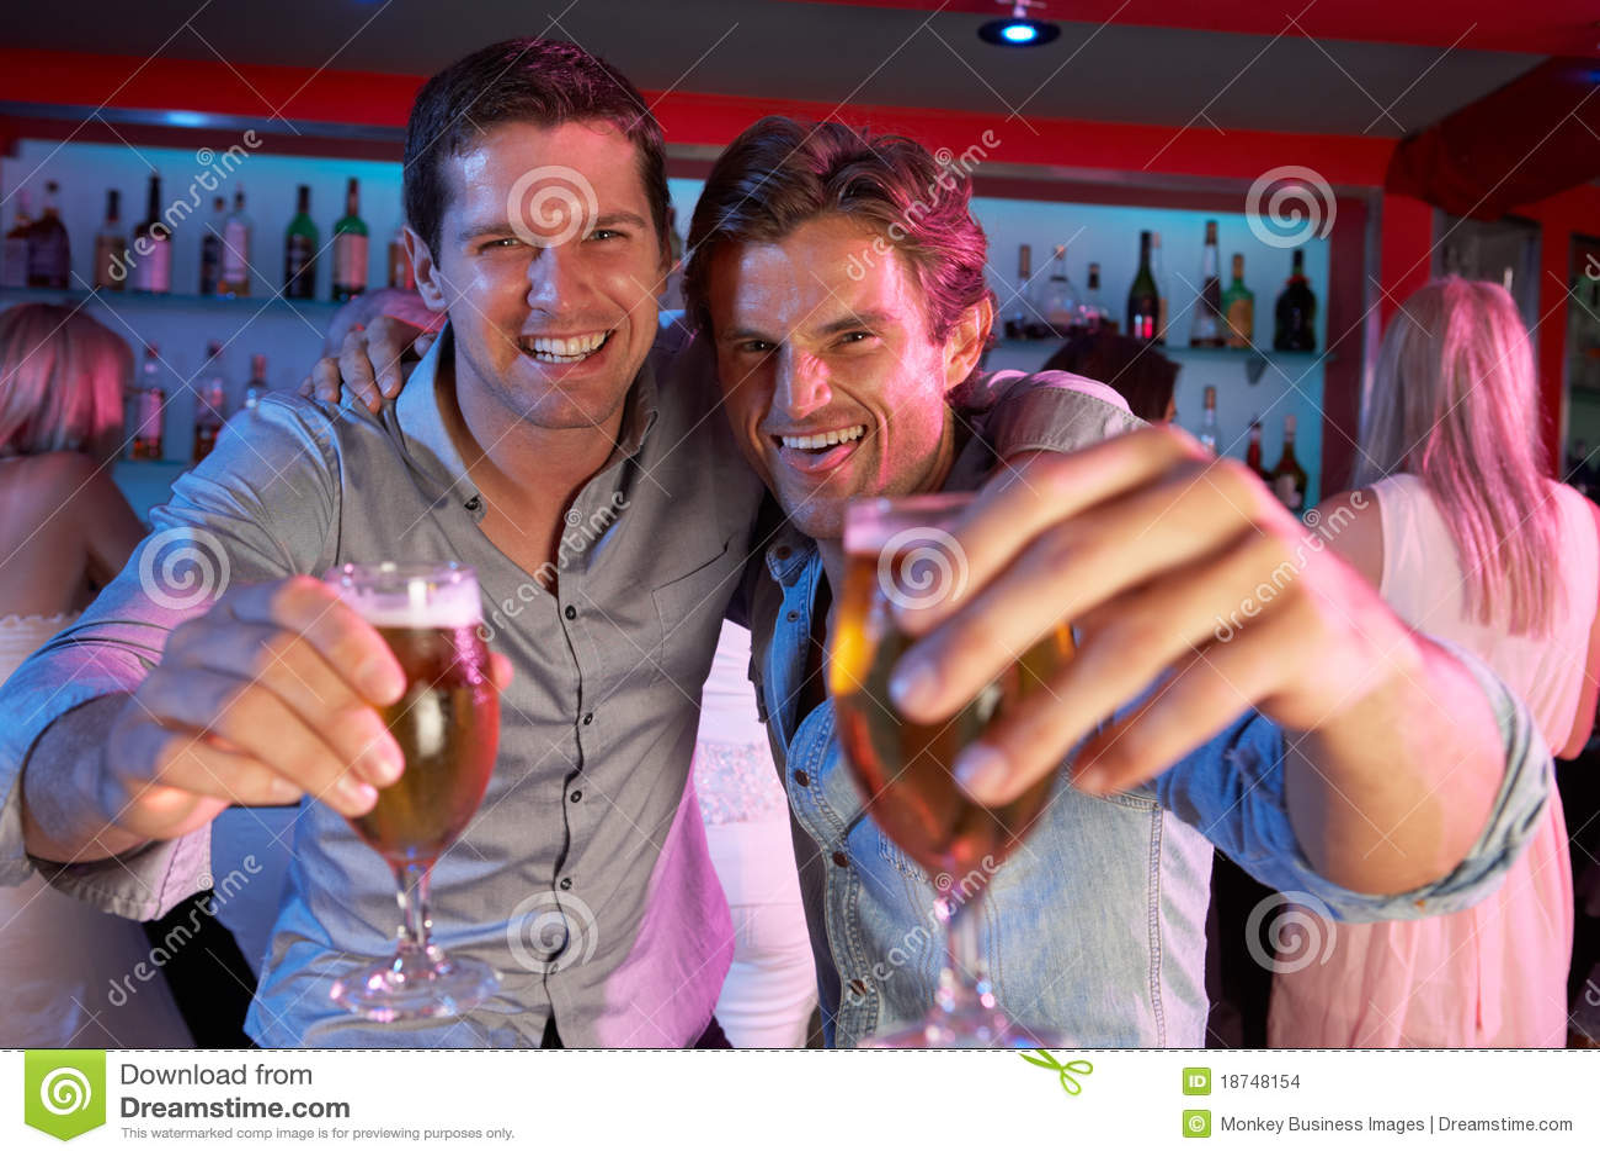 Two Young Men Having Fun In Busy Bar